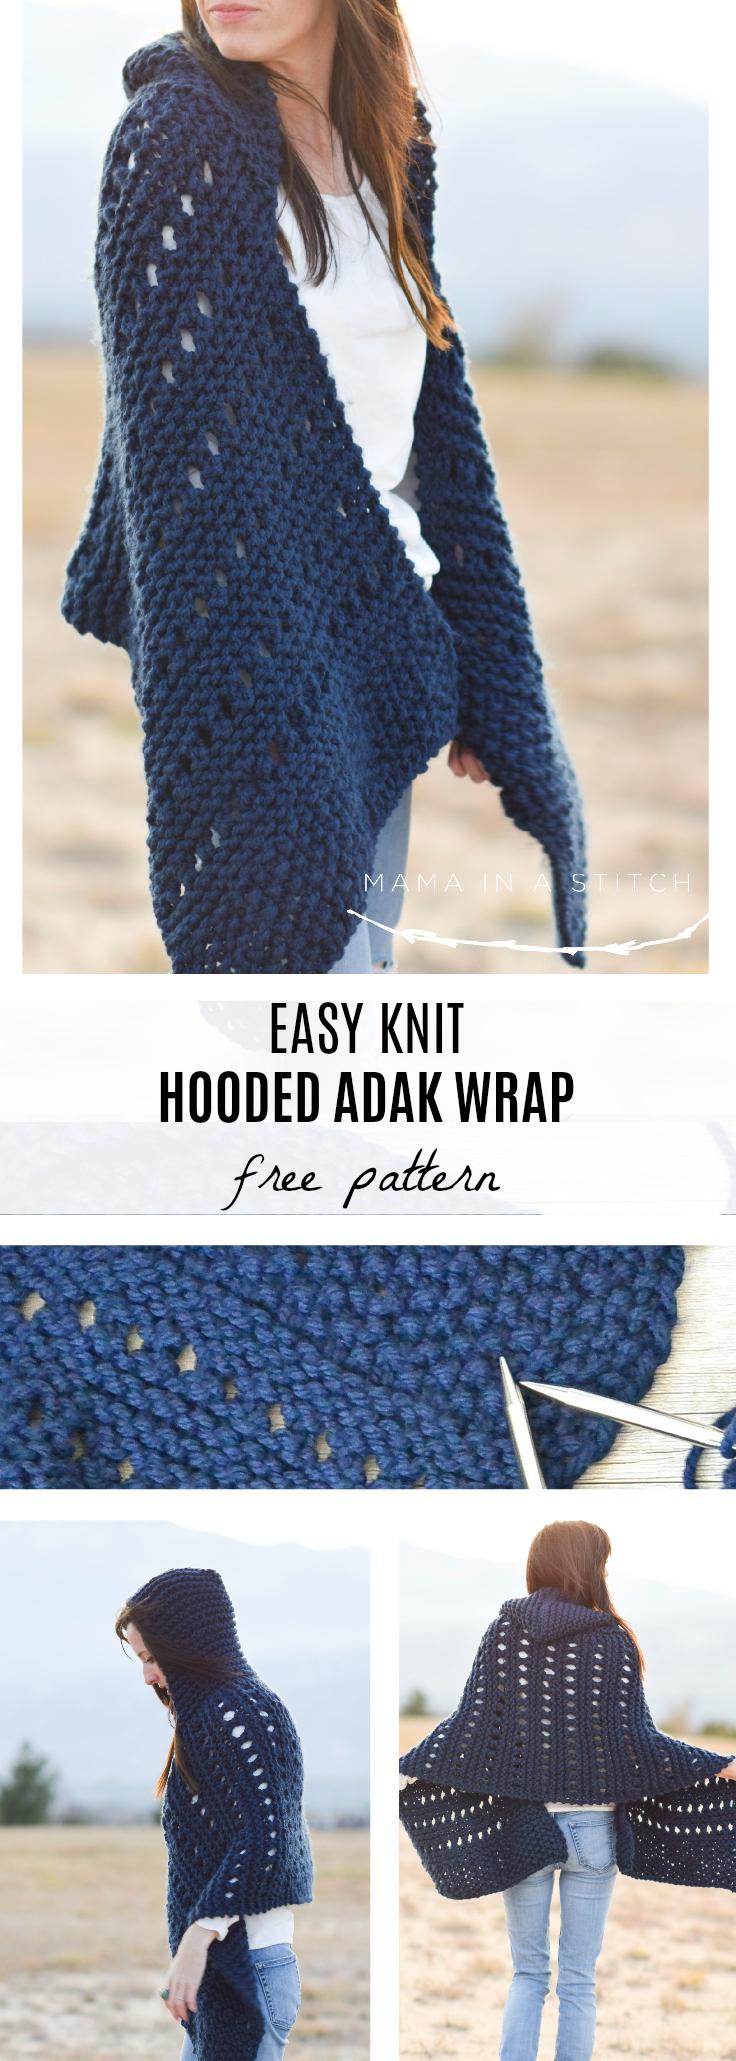 Hooded Knit Adak Wrap Pattern – Mama In A Stitch